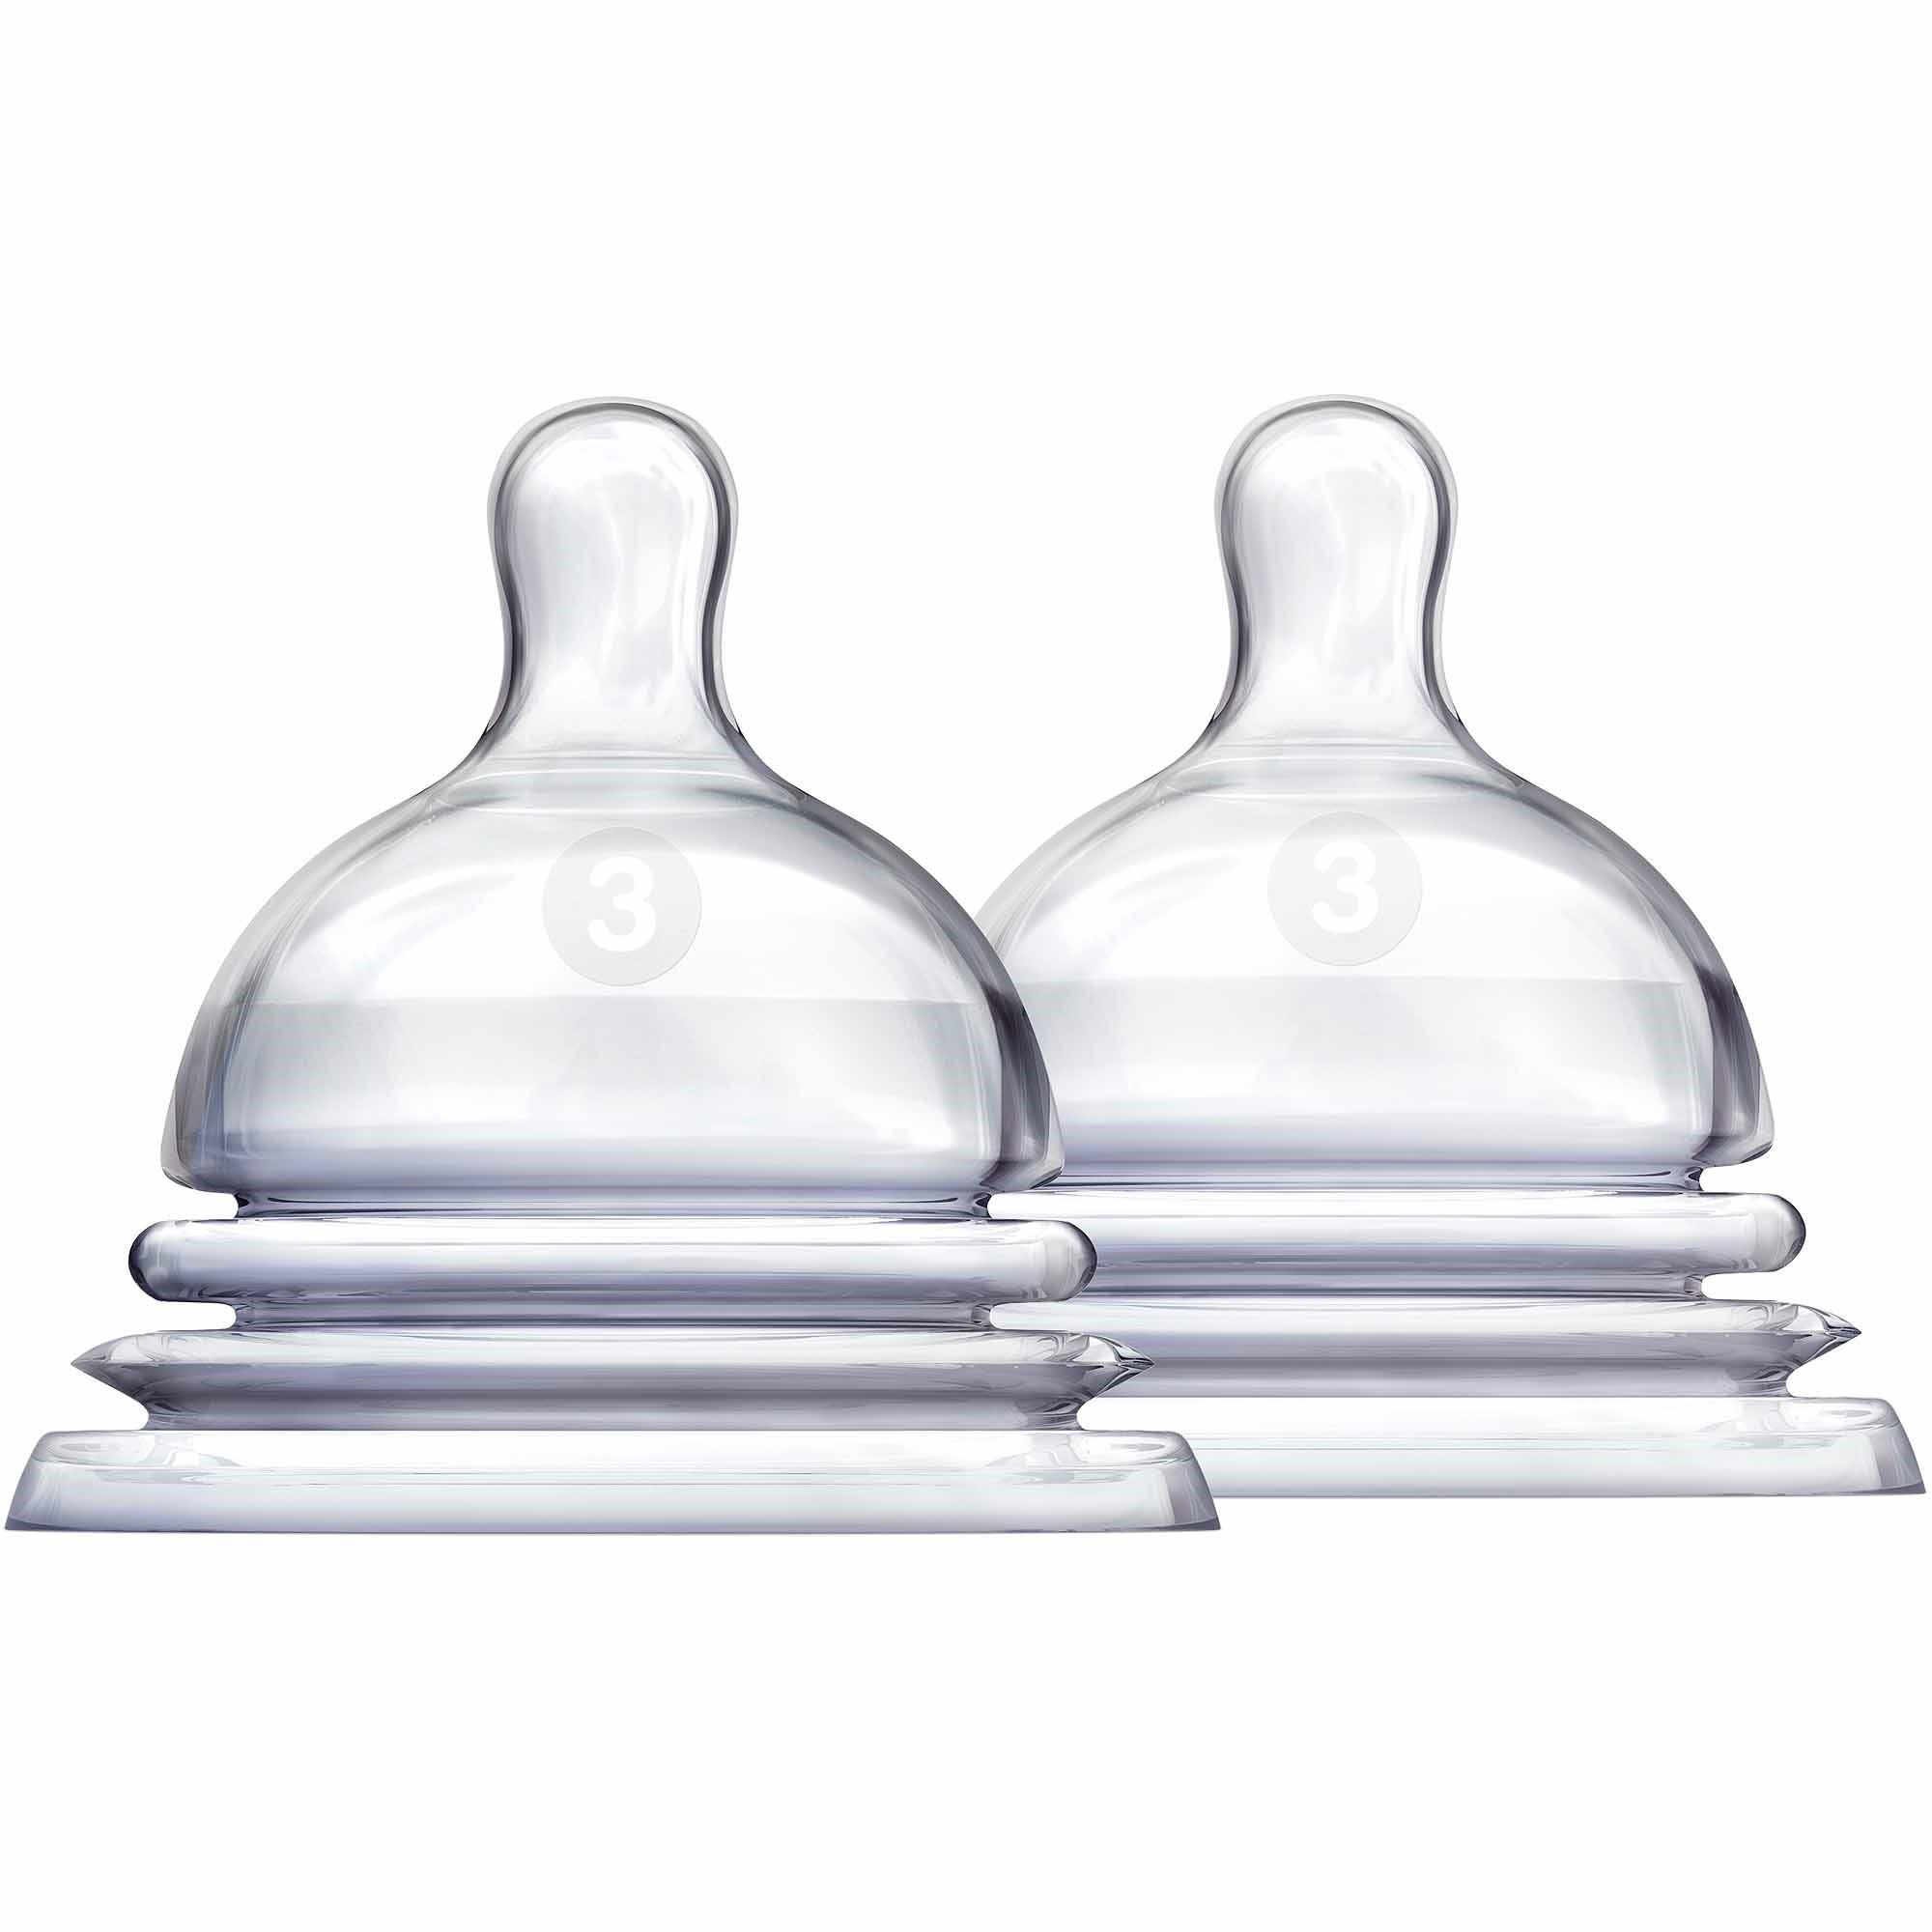 Munchkin LATCH Stage 3 Nipple, BPA-Free, 6+ Months - 2pk